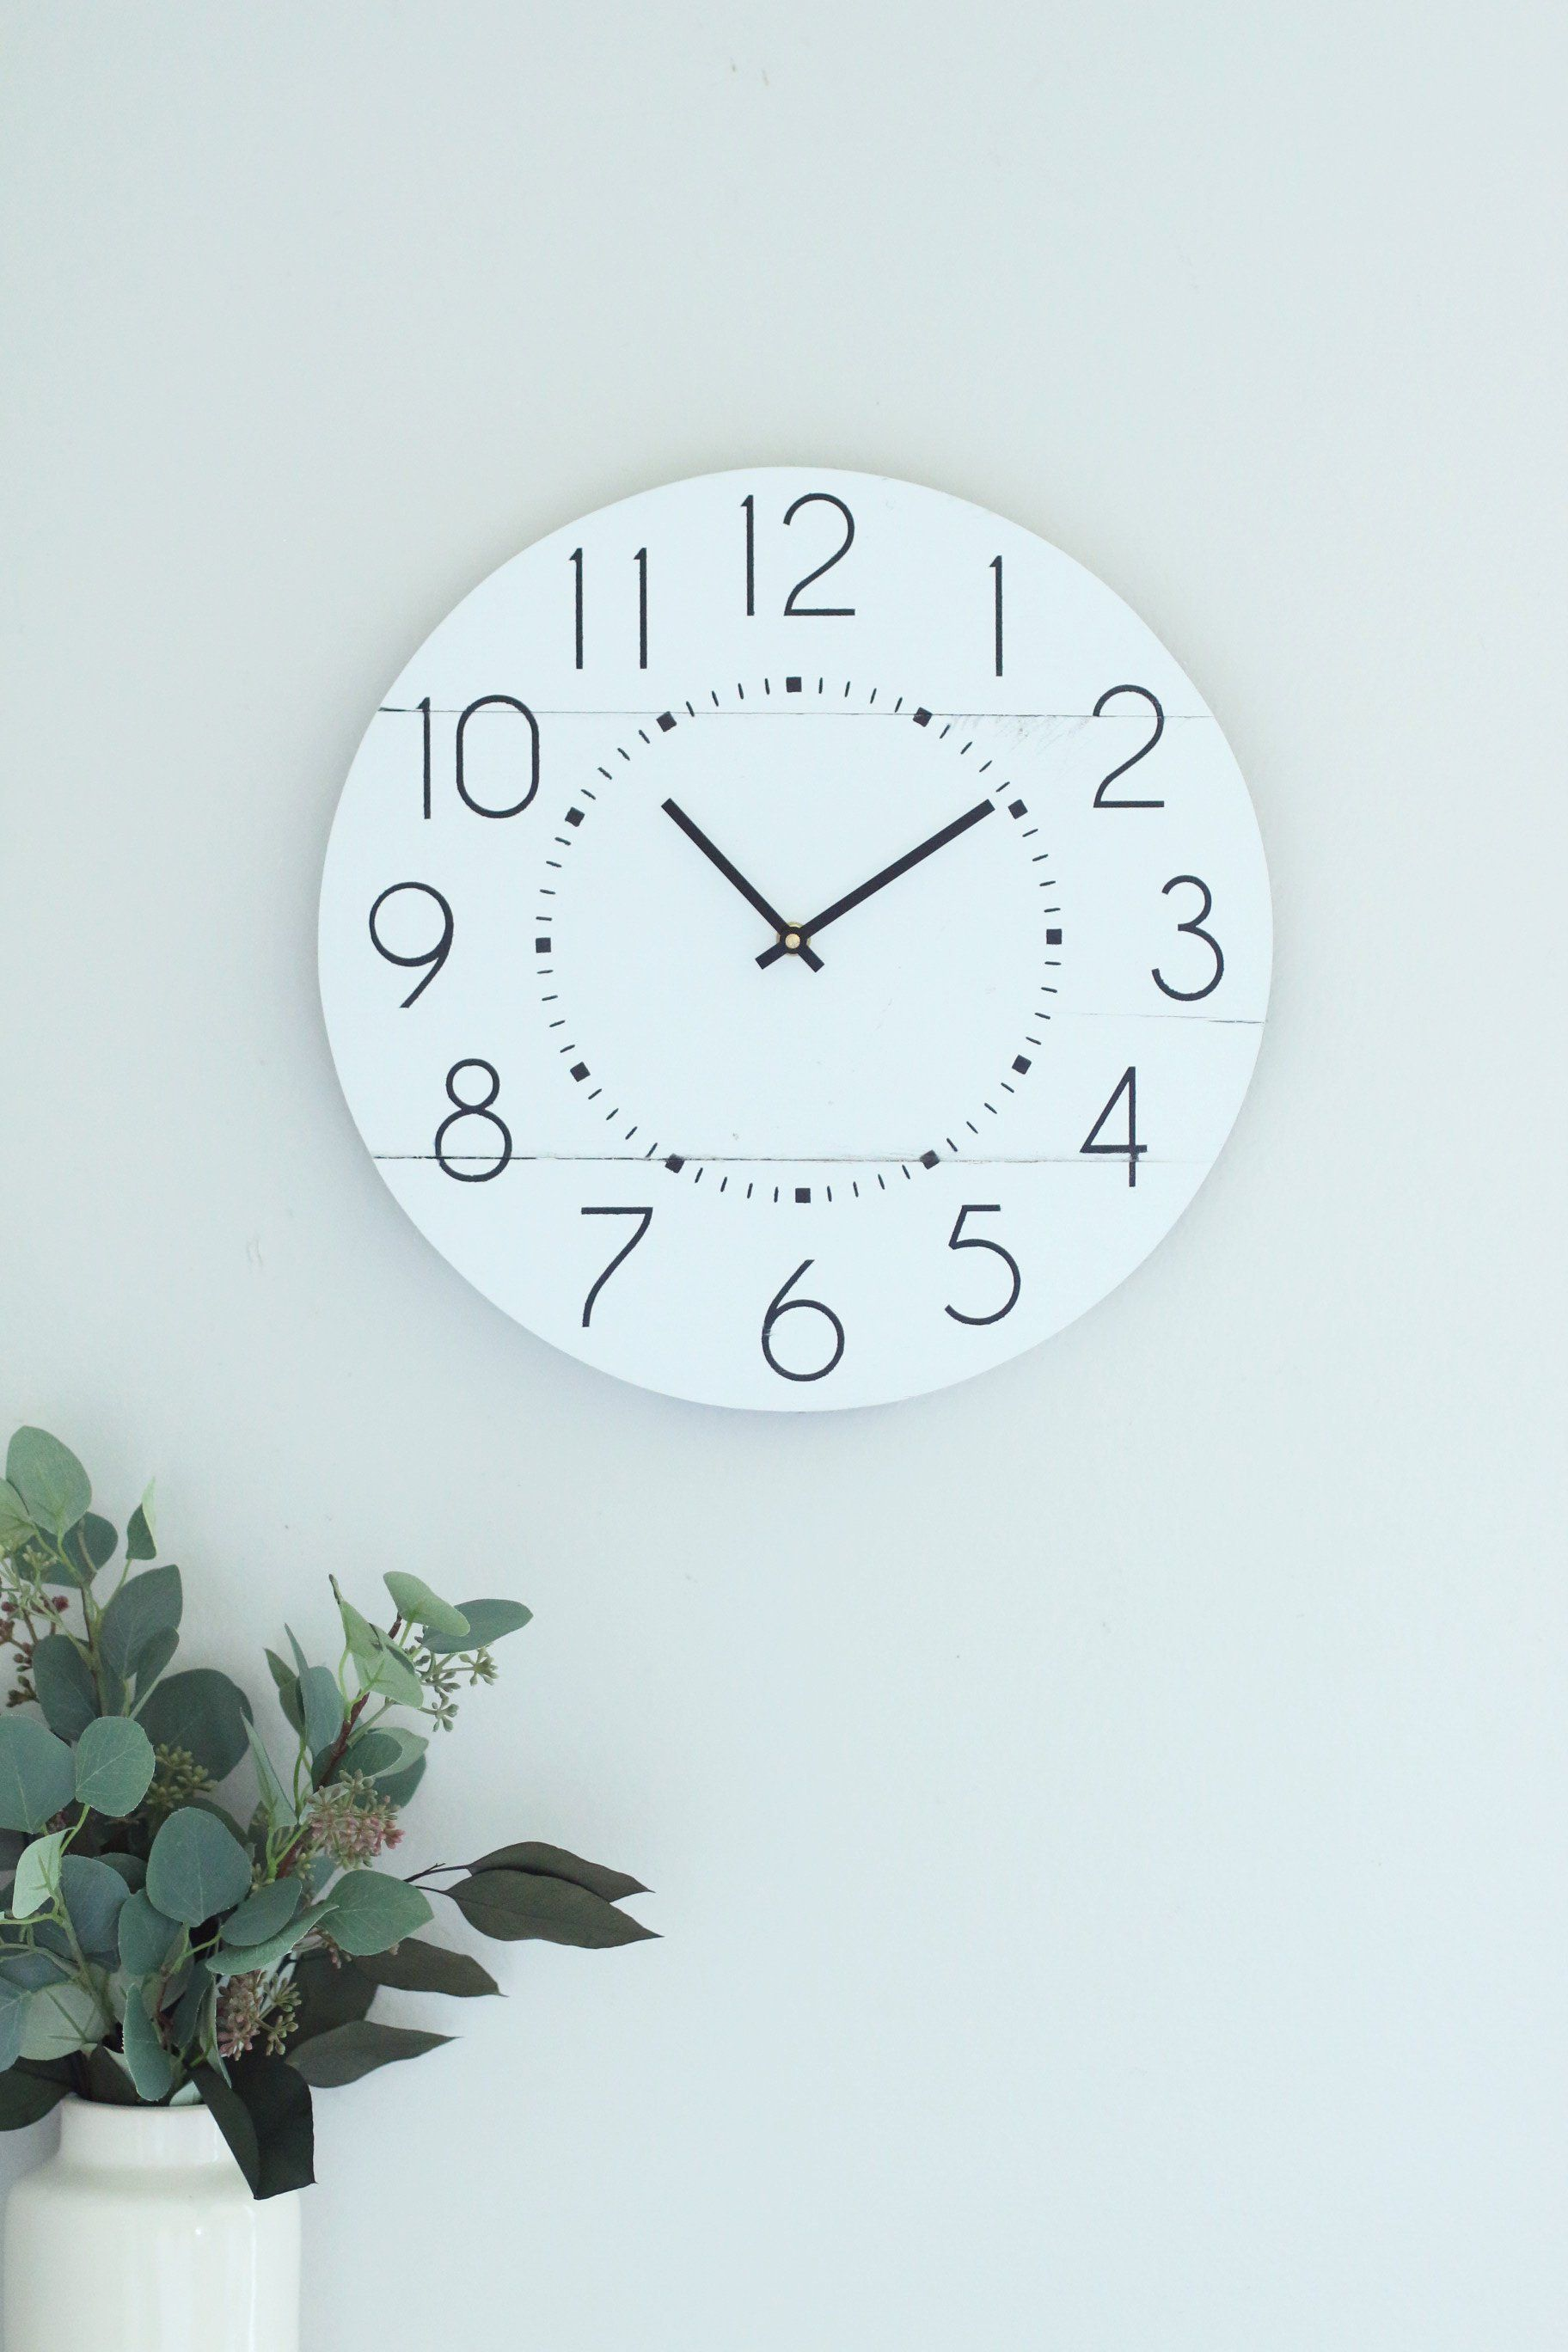 White Wall Clock Classic Wall Clock Modern Wall Clock Home Decor Wall Decor Scandinavian Wood Clock Minim Wall Clock Modern Wall Clock Classic Wall Clock